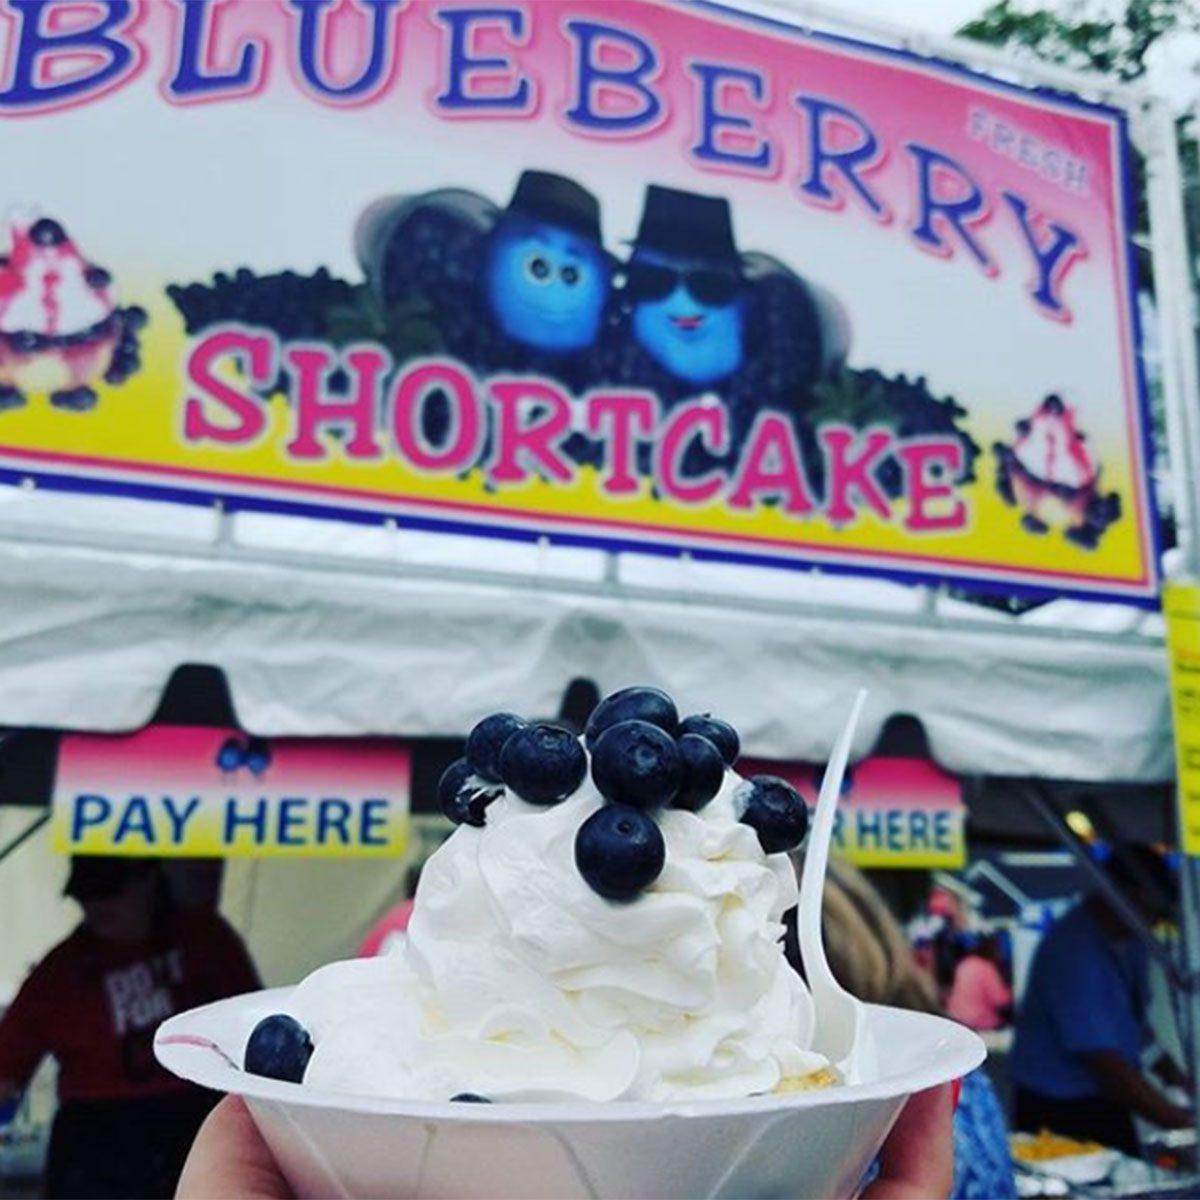 Florida Blueberry Festival